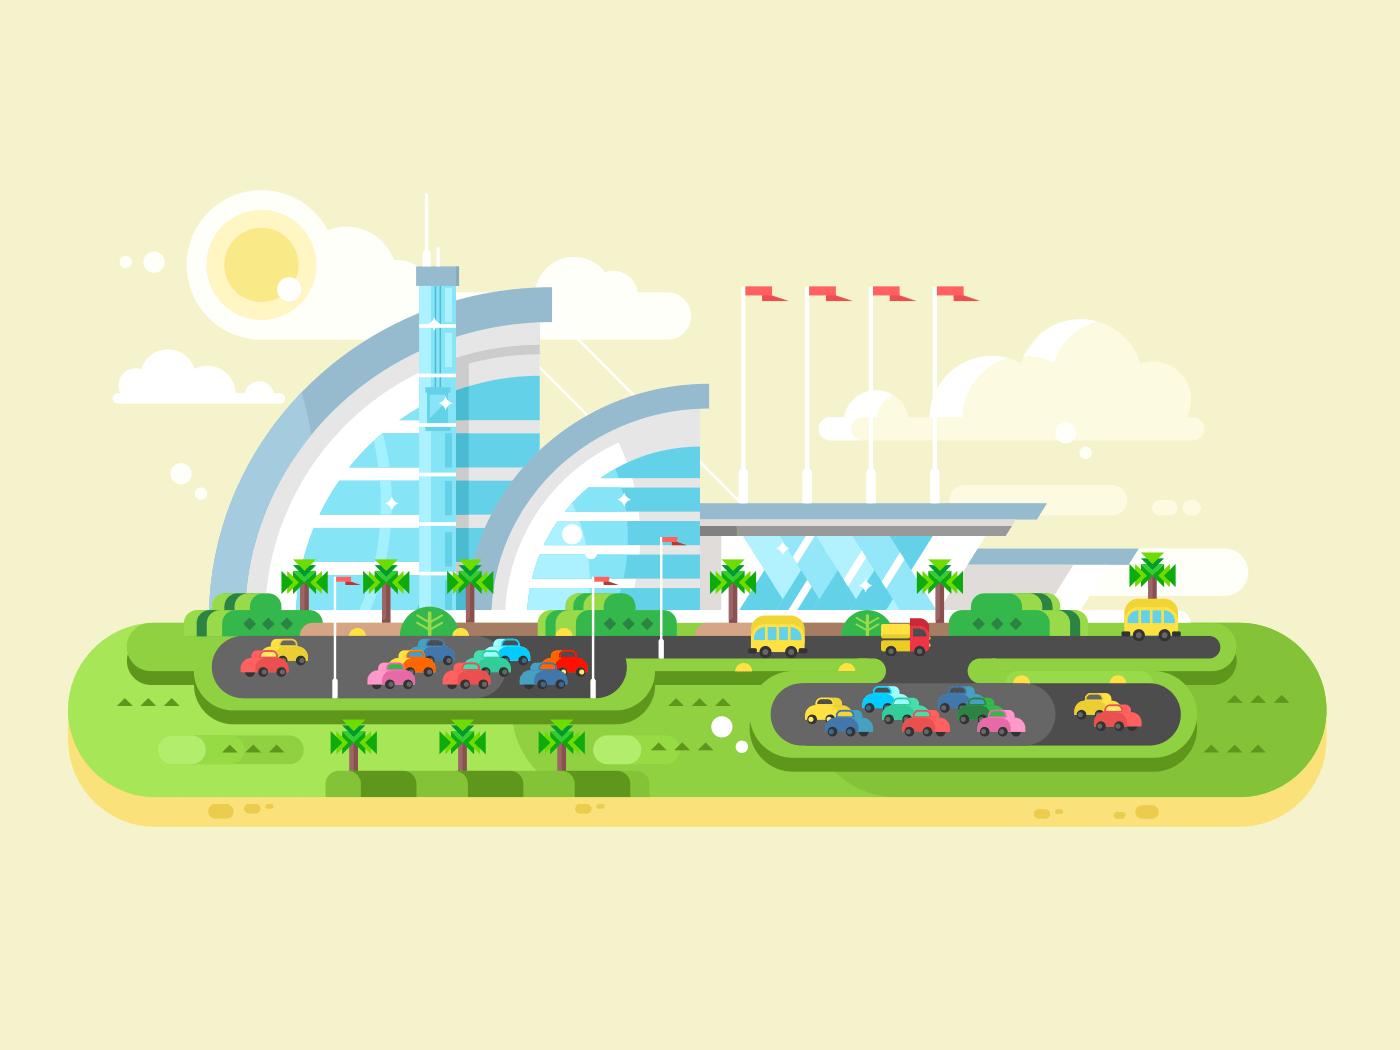 Shopping center mall flat vector illustration